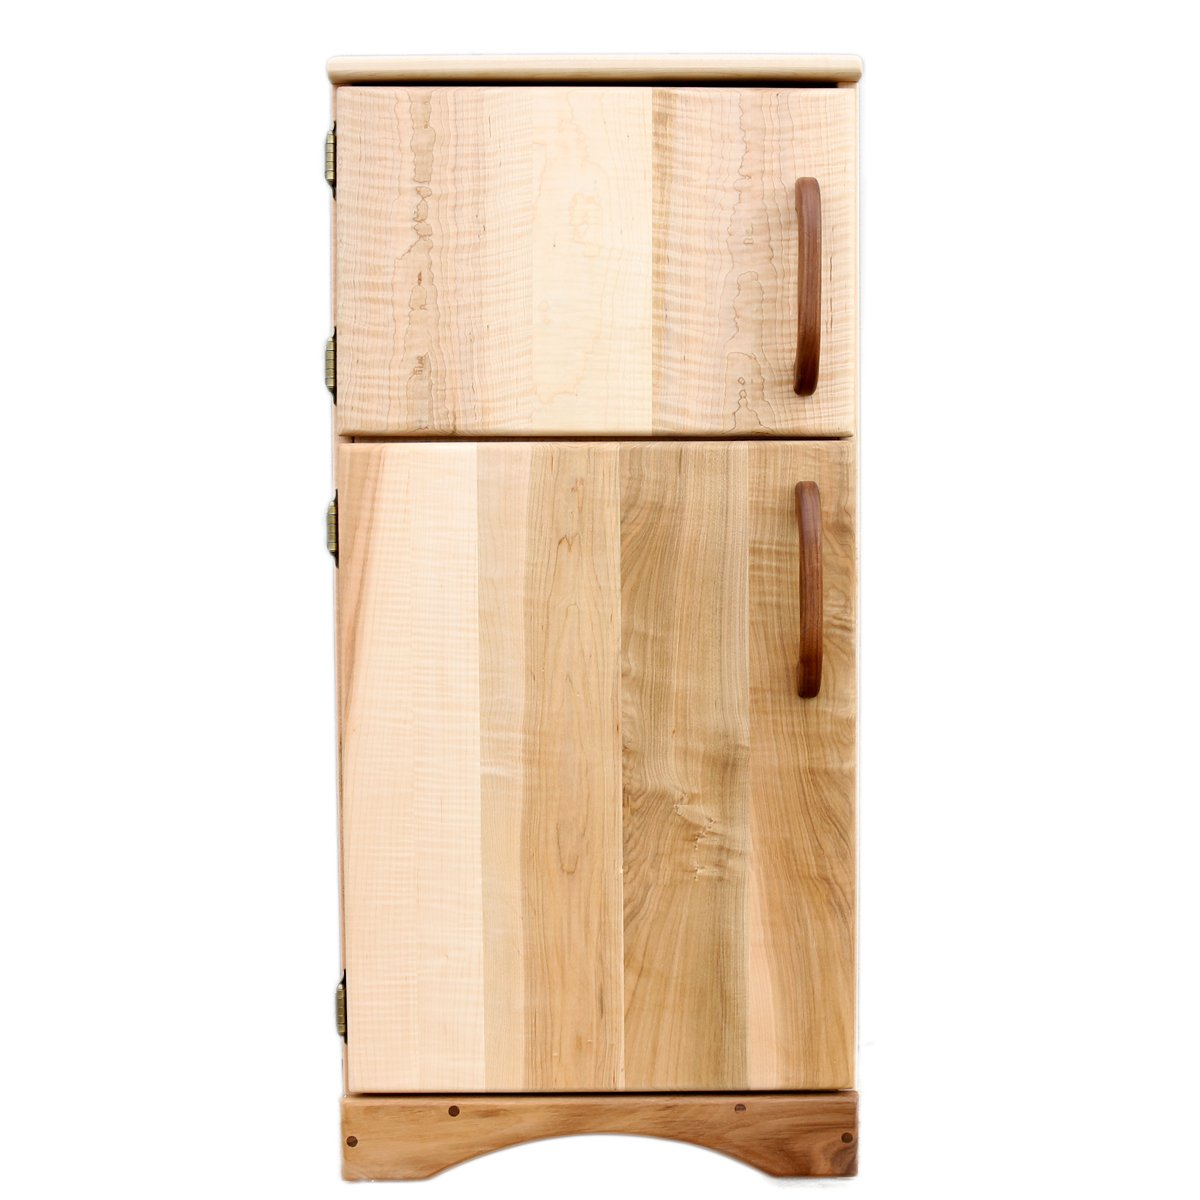 Camden Rose Simple Fridge (Child's Maple Wood Play Refrigerator) by Camden Rose